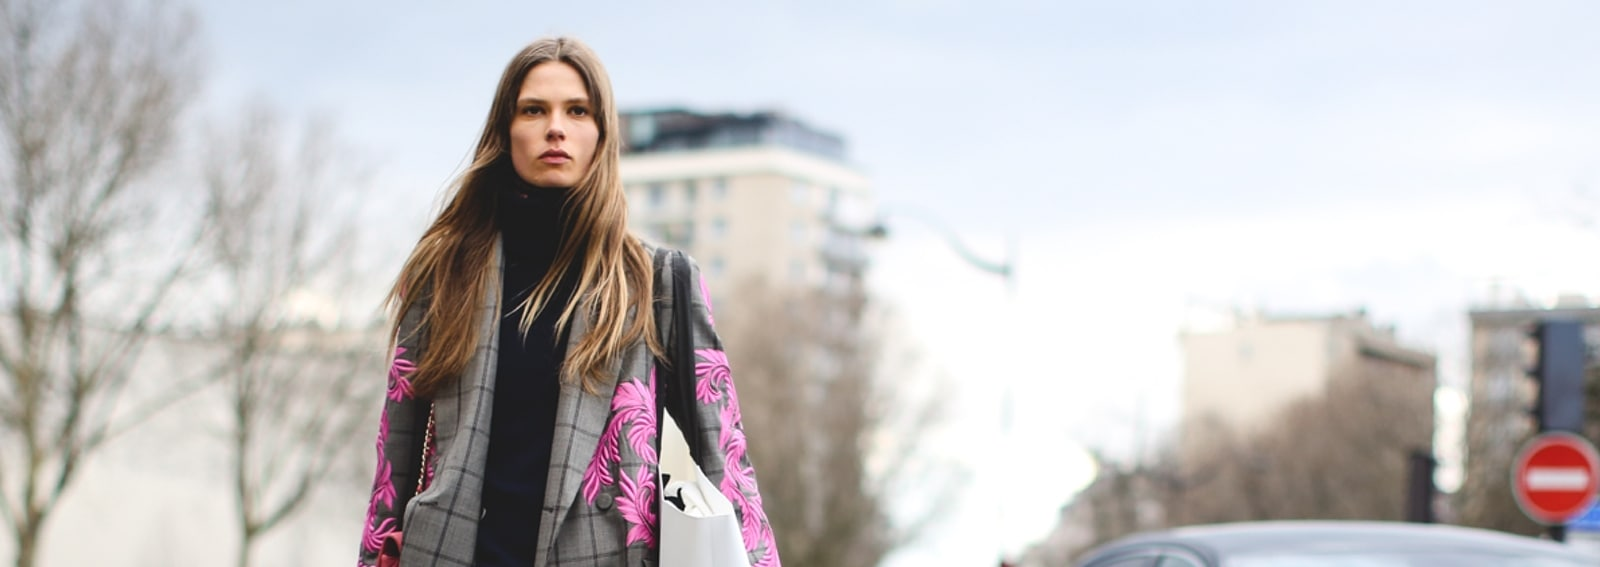 cover-capelli-street-style-paris-fashion-week-desktop